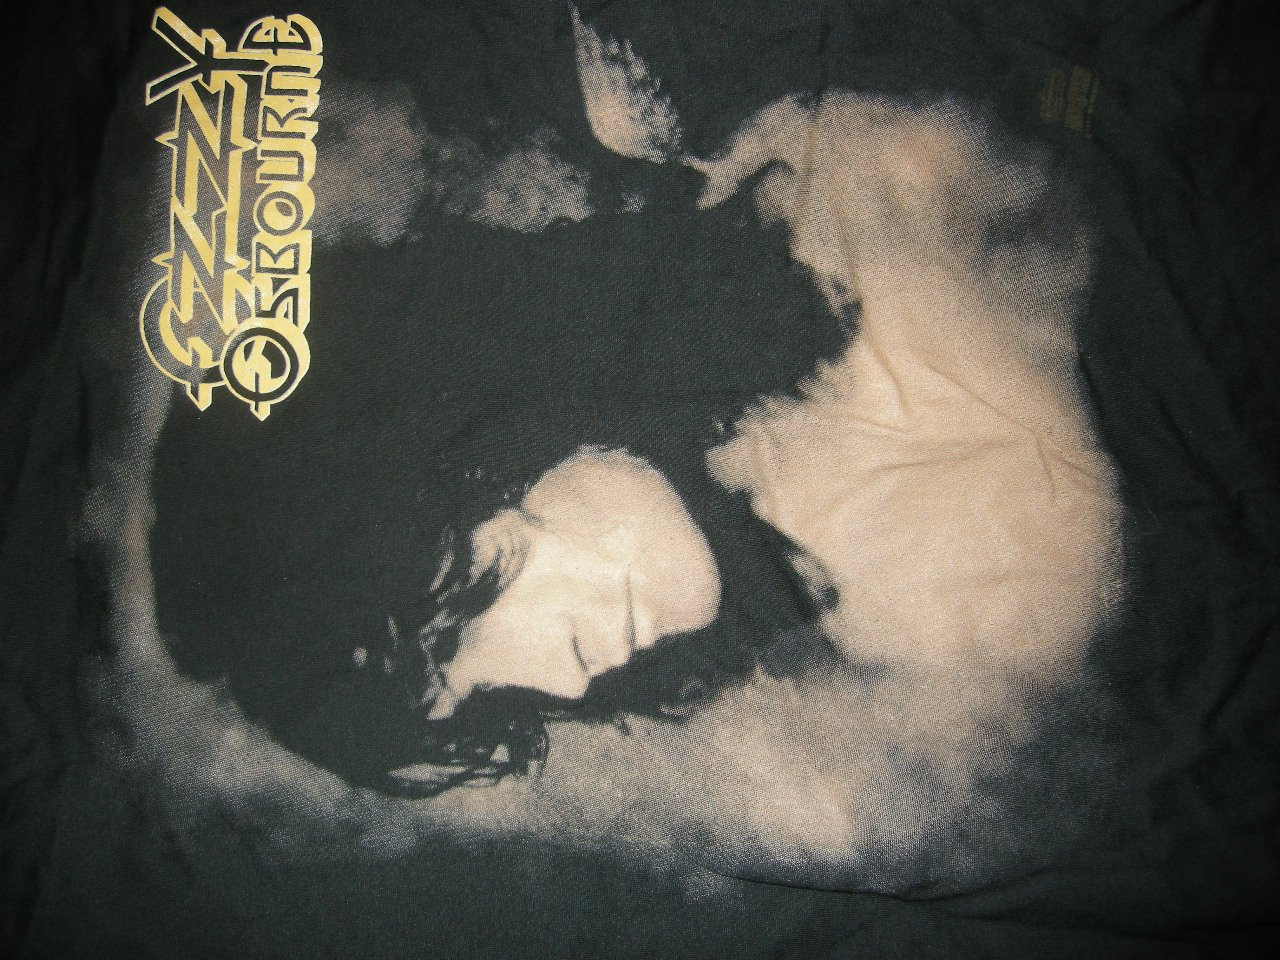 OZZY OSBOURNE SHIRT No More Tours 1992 zakk wilde L VINTAGE